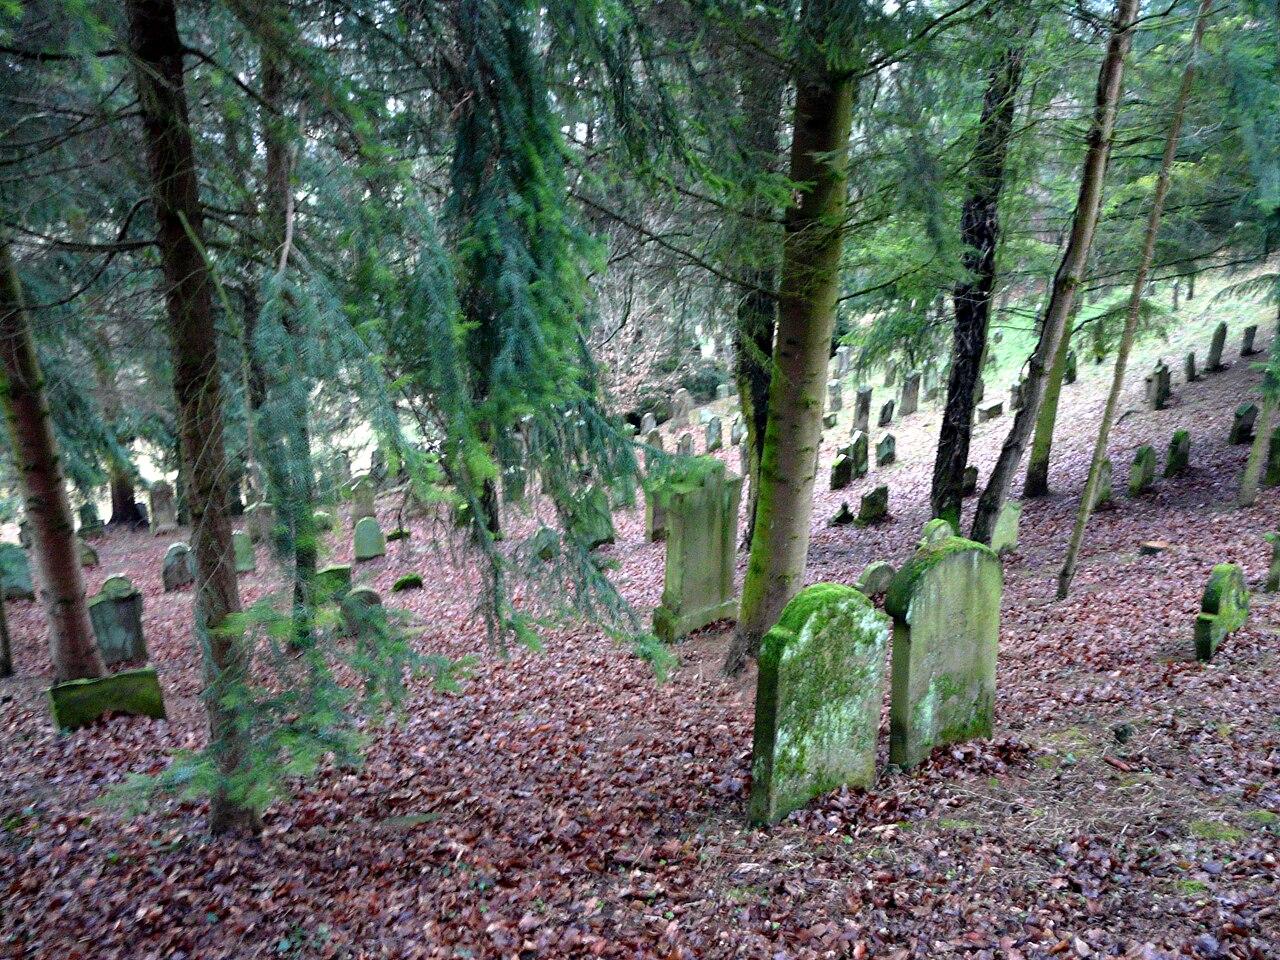 Juedischer Friedhof Oberoewisheim 03 fcm.jpg